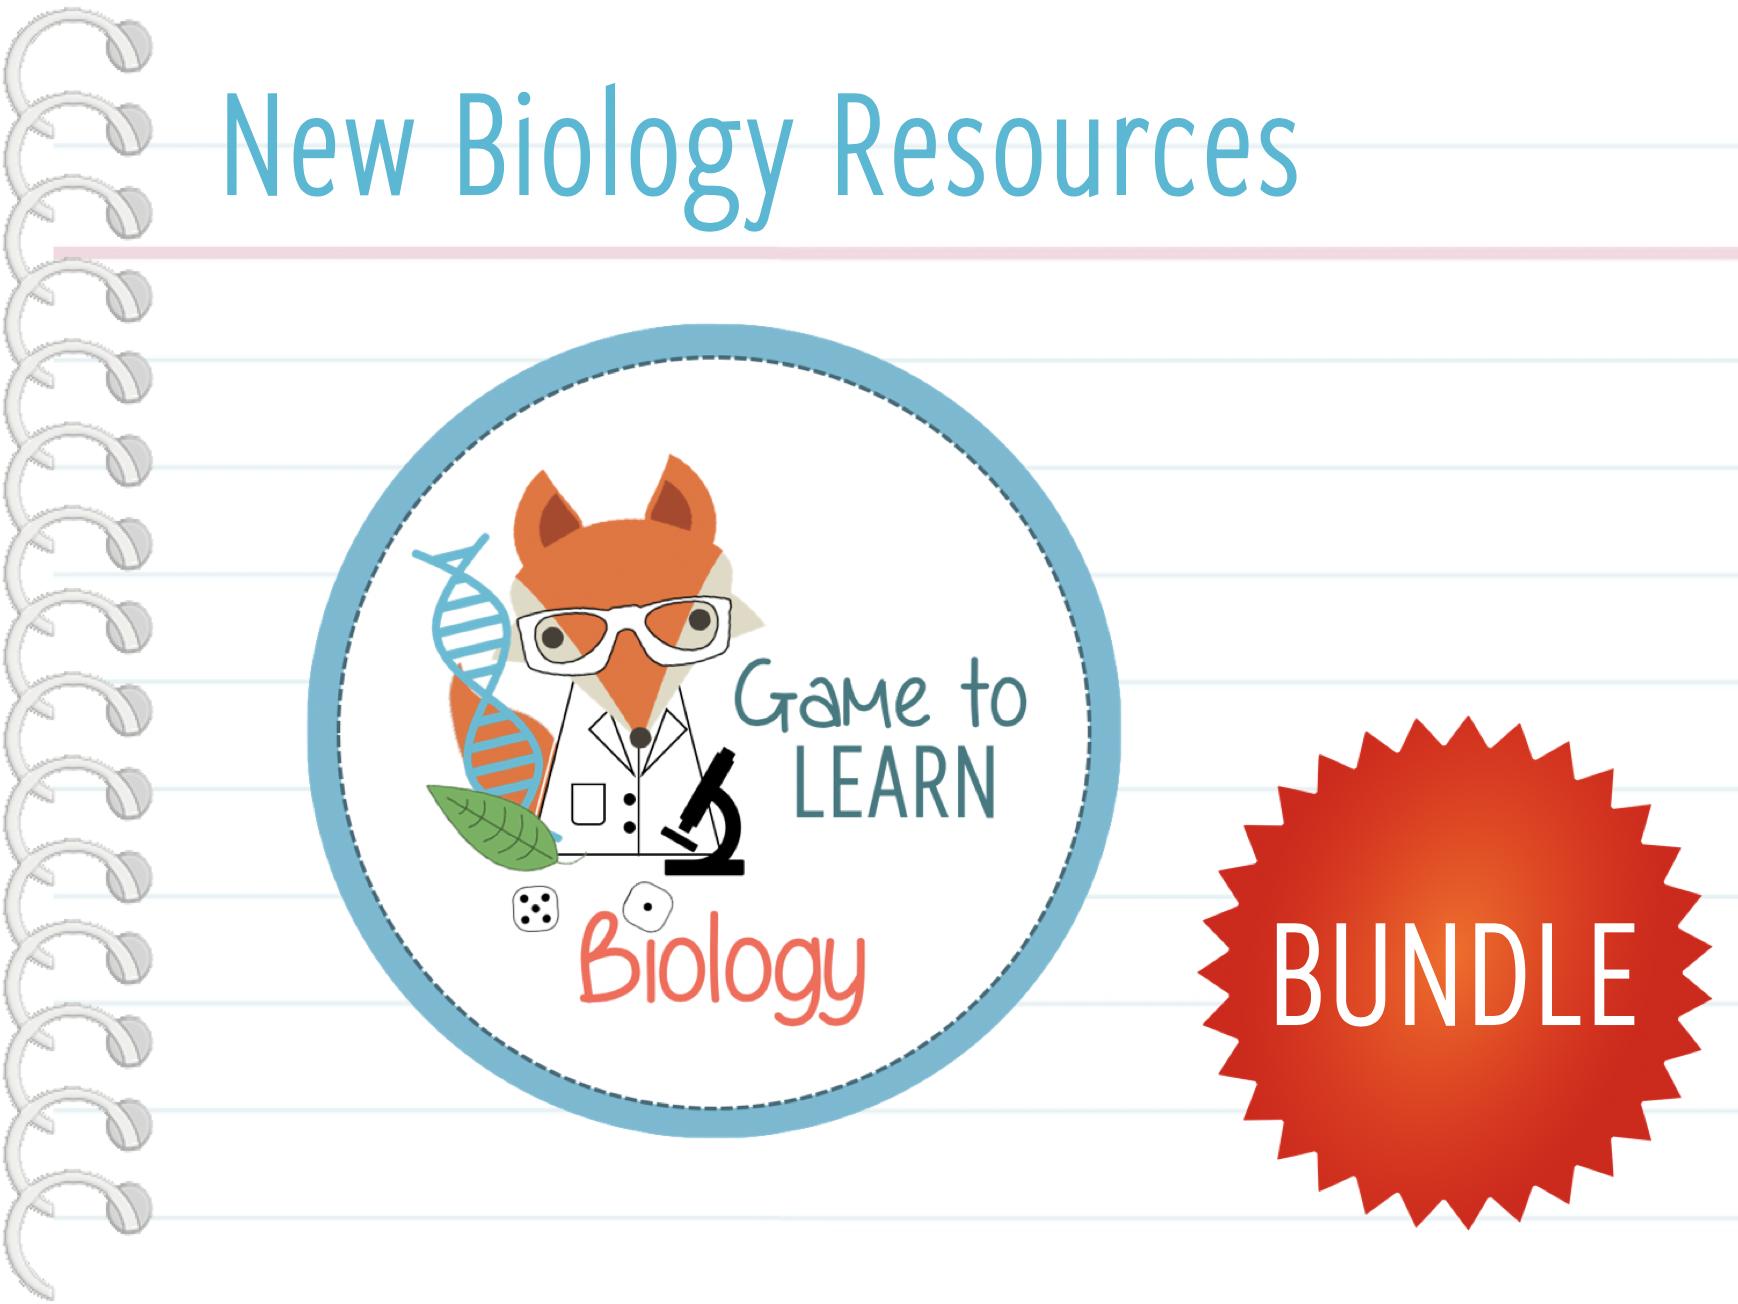 New Biology Resources Bundle